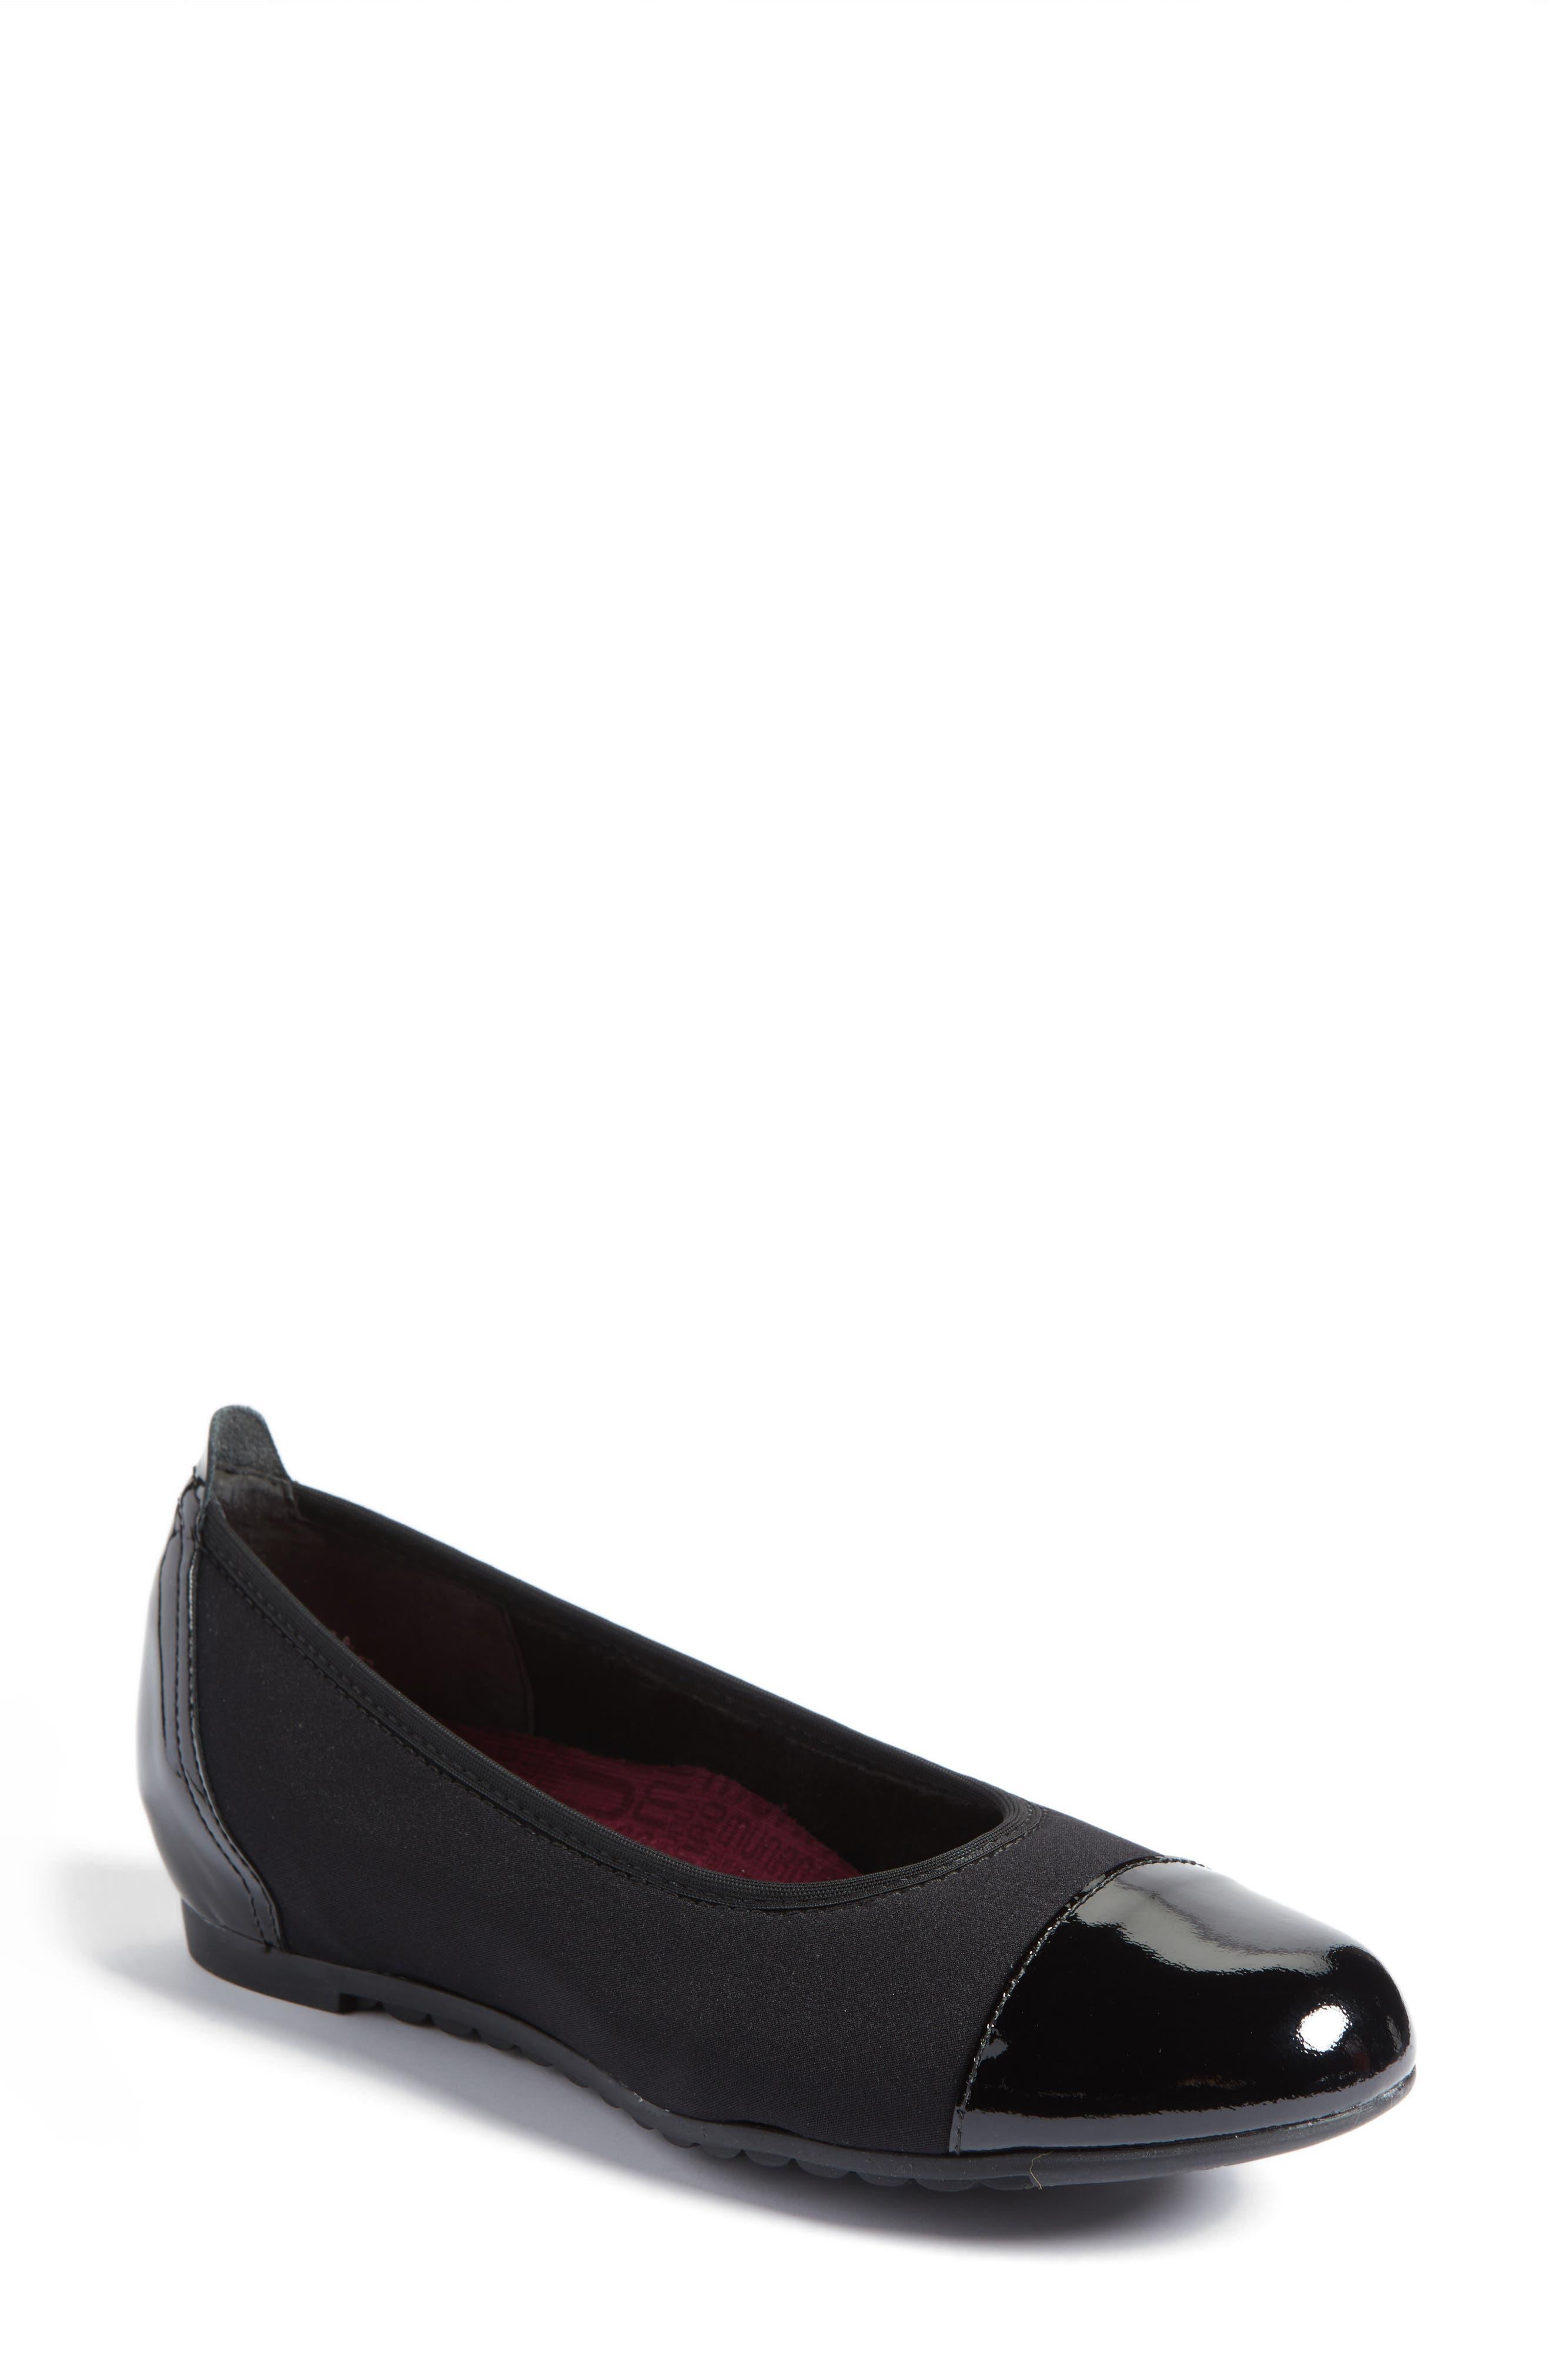 MUNRO Henlee Cap Toe Flat, Main, color, BLACK FABRIC